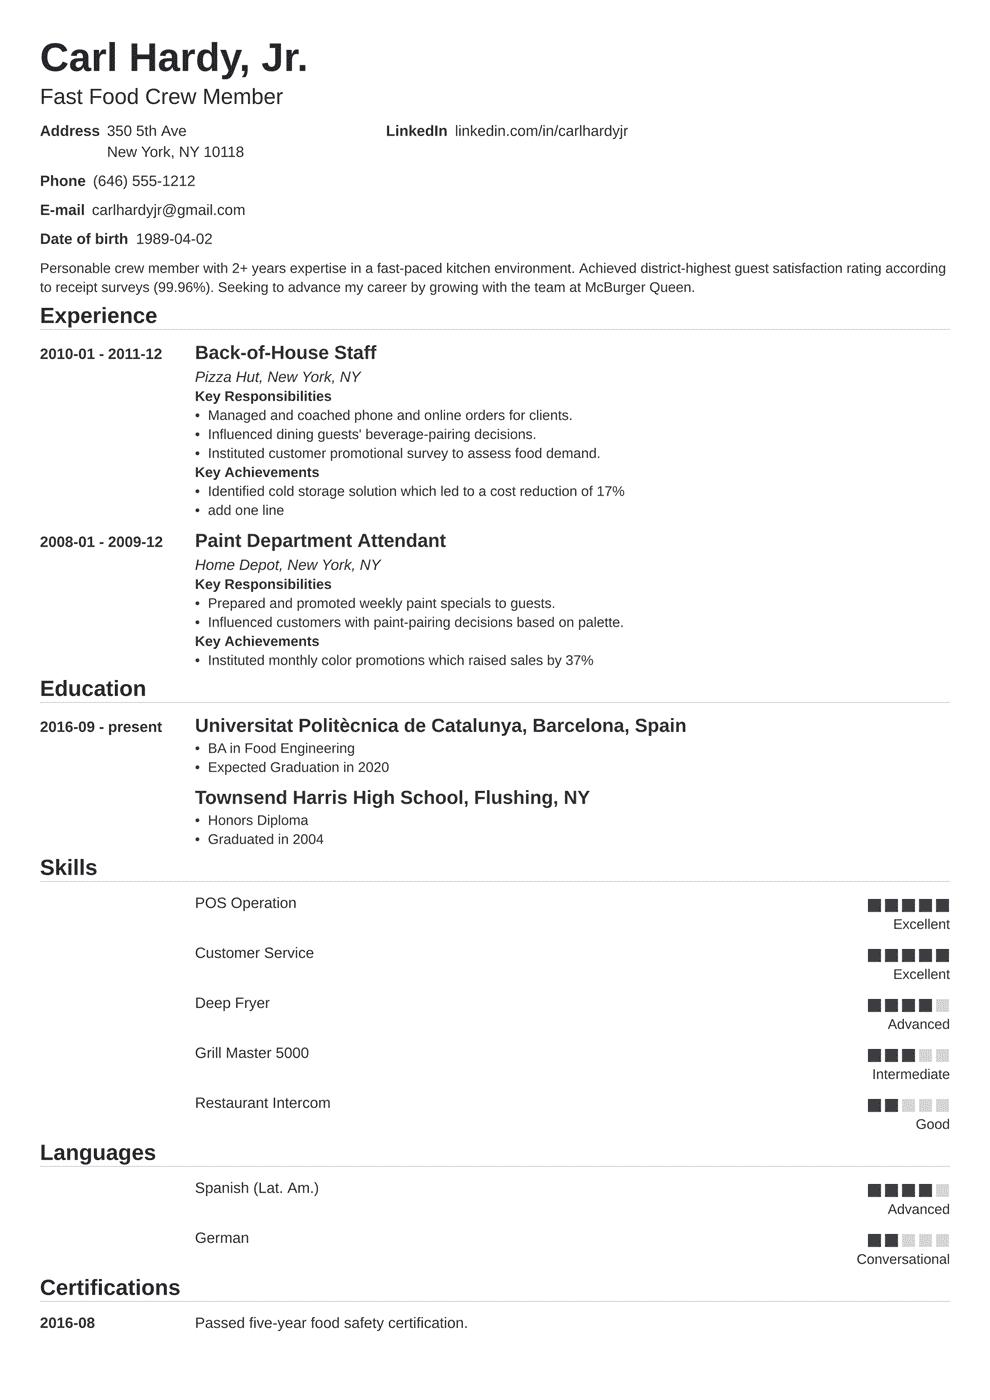 create biodata for marriage online 2019 create biodata for marriage online free 2020 create biodata for marriage online tamil create biodata for marriage online pdf create biodata for marriage online with photo